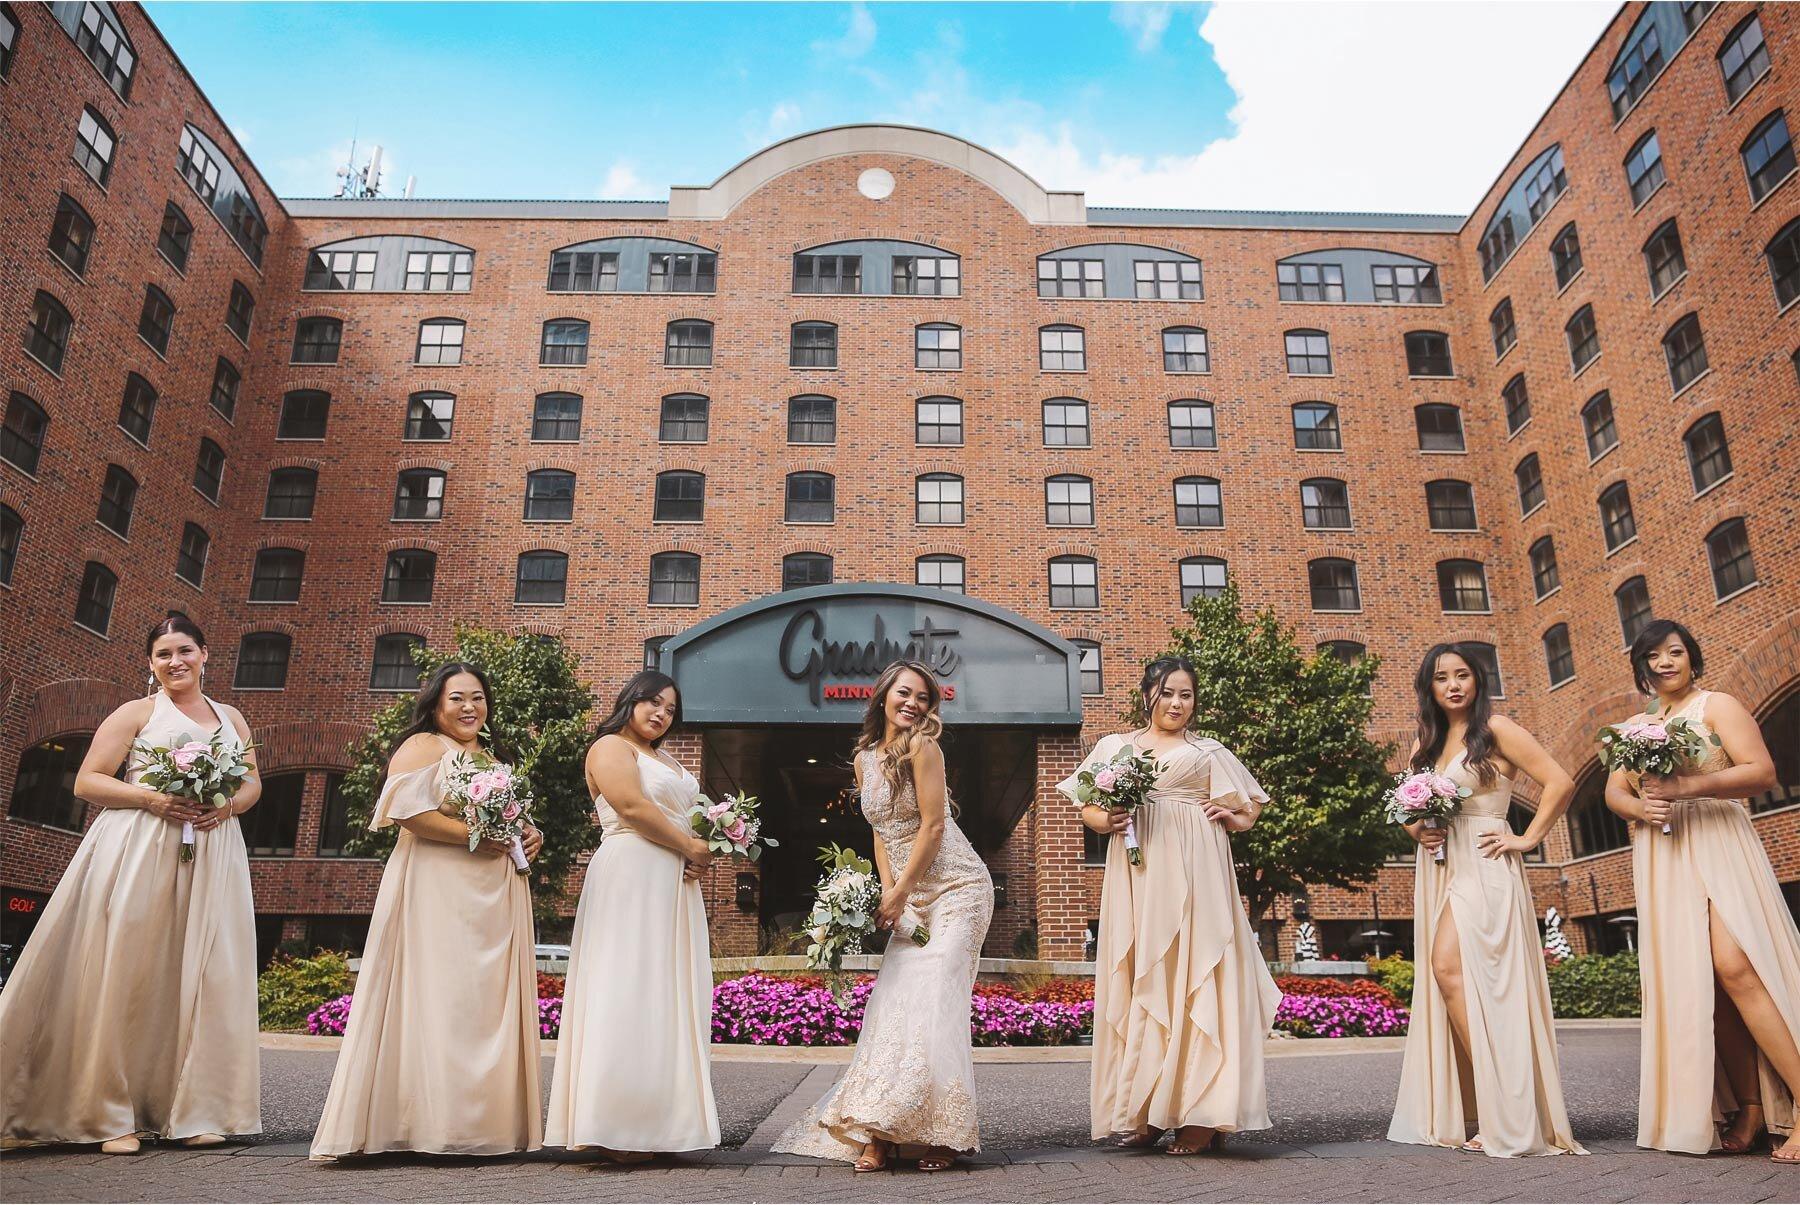 07-Vick-Photography-Minneapolis-Minnesota-The-Graduate-Exterior-Hotel-Bride-Bridesmaids-Mai-&-Ross.jpg